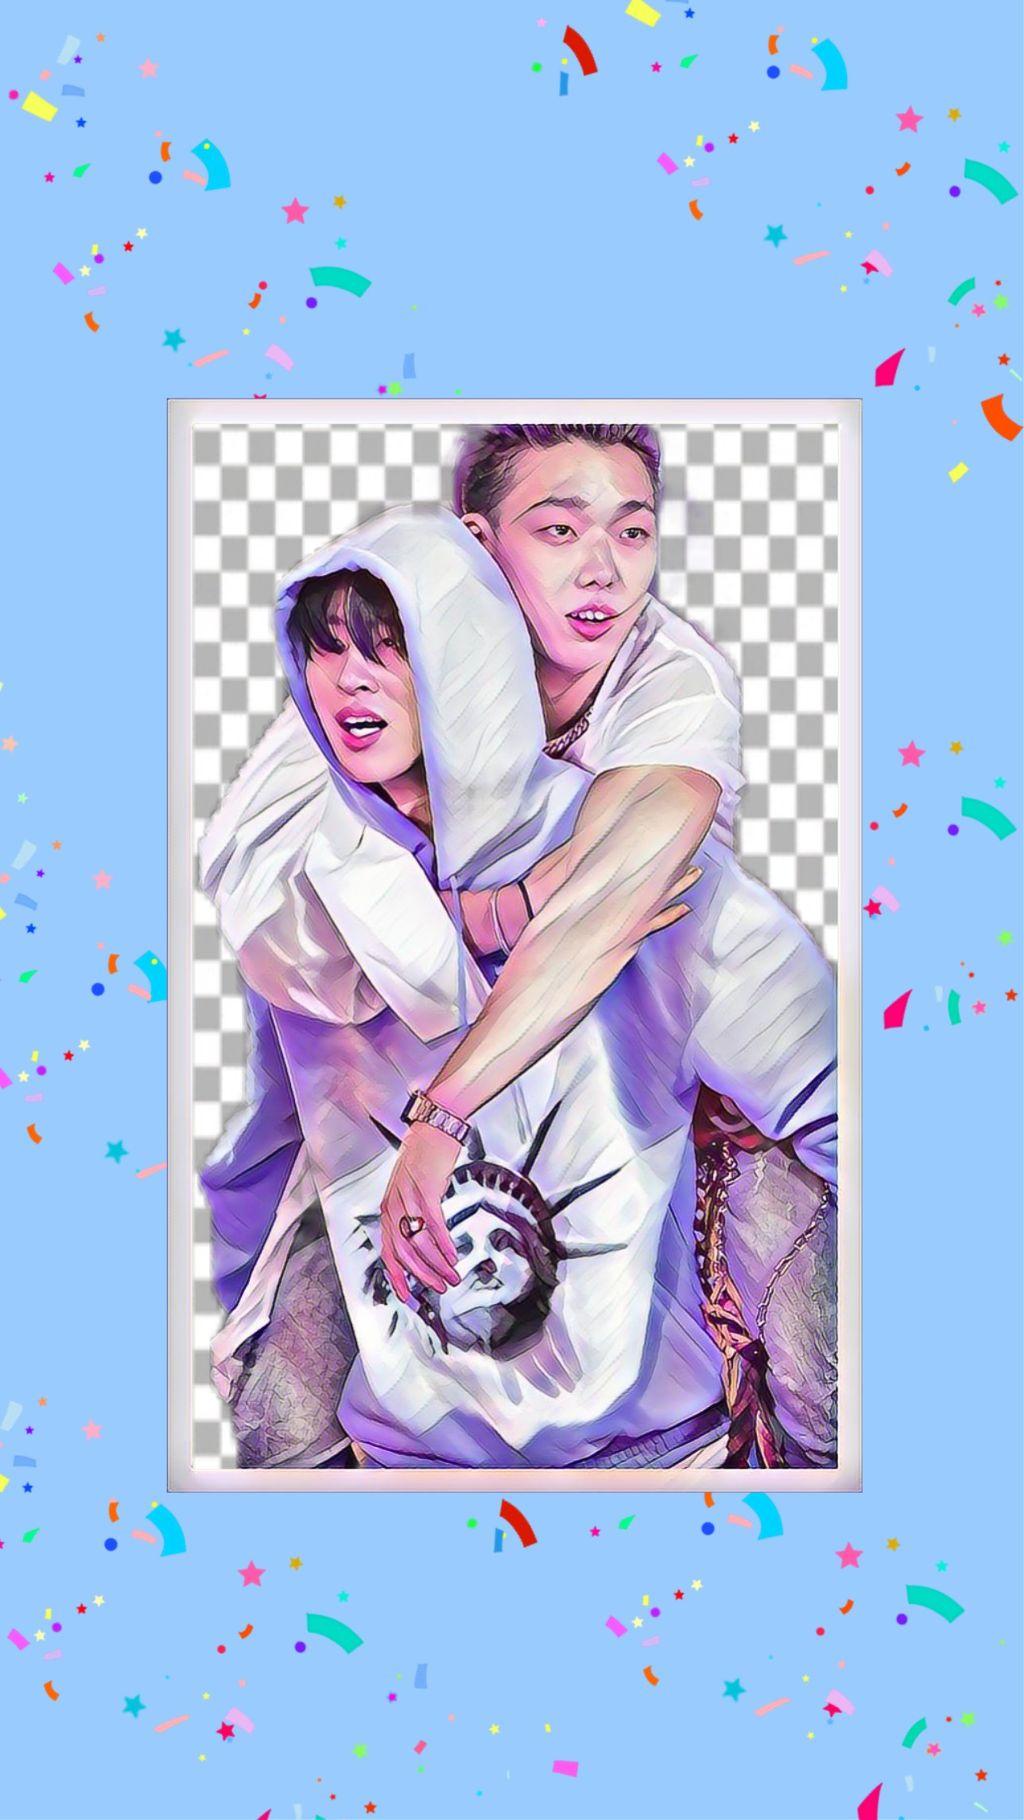 Kpop Wallpaper Ikon Bi Bobby Hanbin Image By